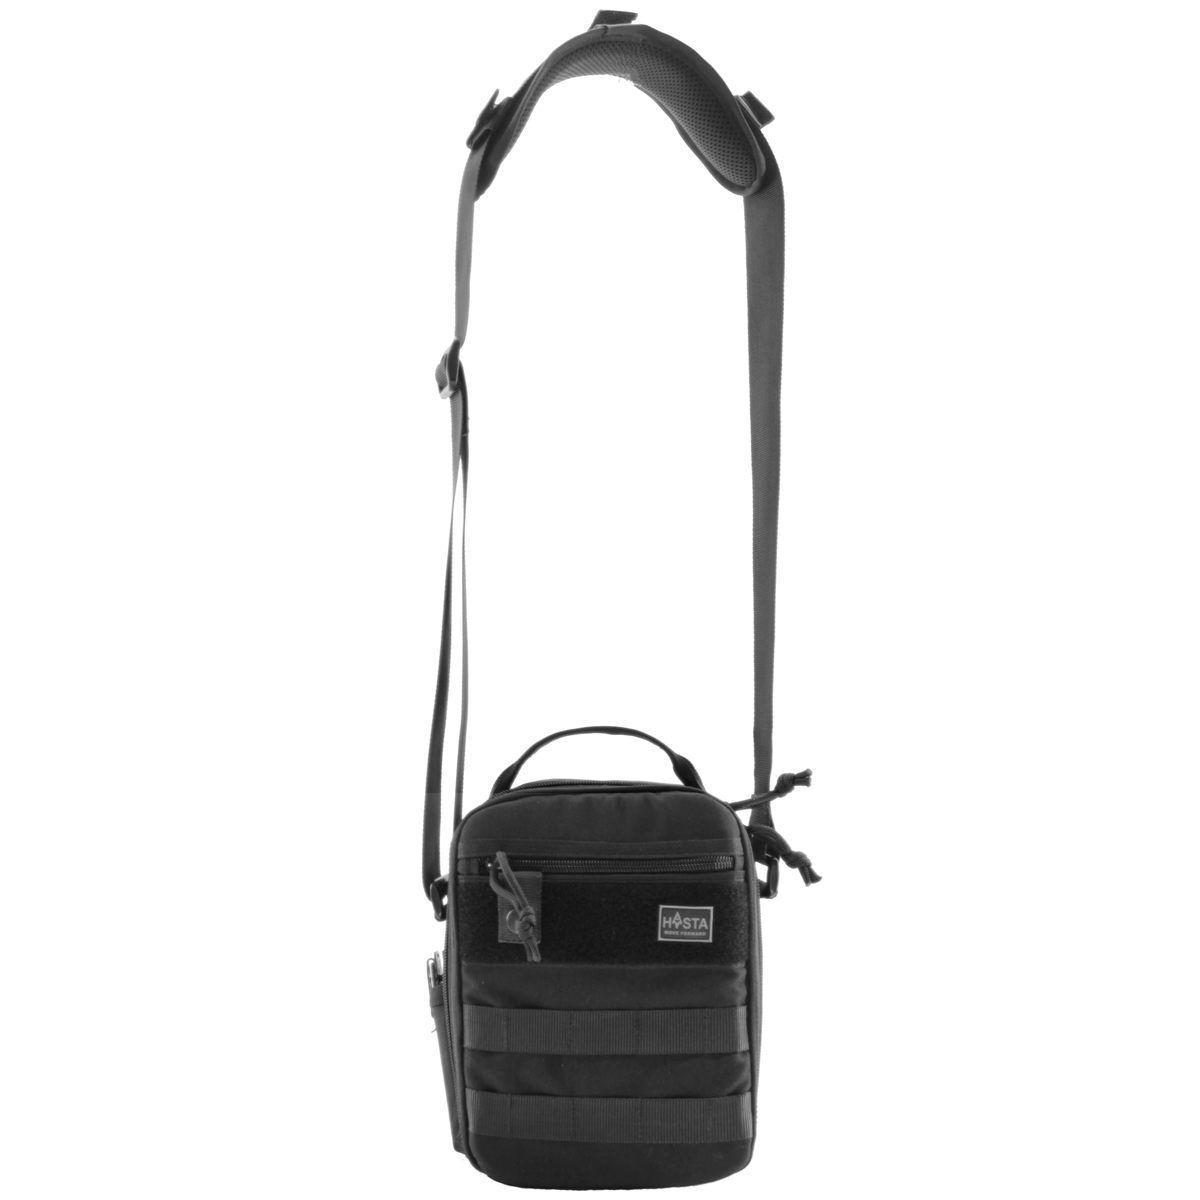 a2aea7113124 Сумка Hasta Multibag S Black (11 001 099), цена 869 грн., купить  Хмельницький — Prom.ua (ID#861402228)